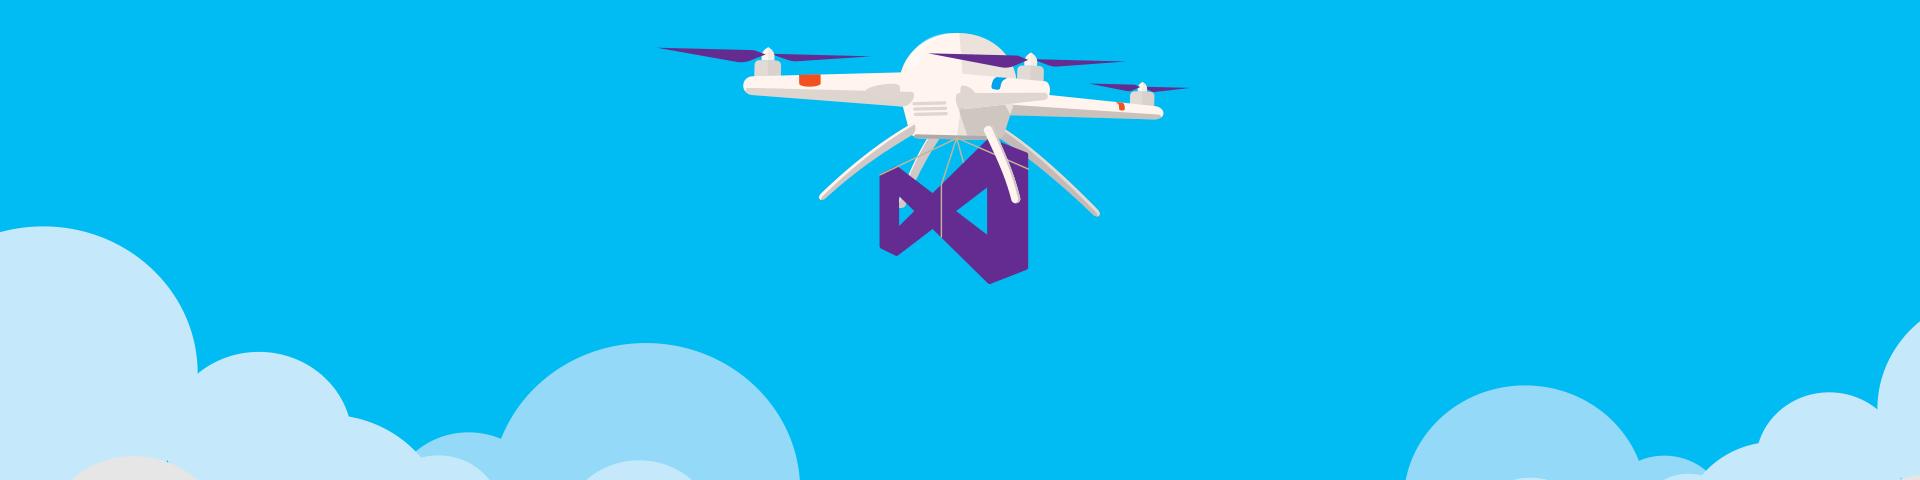 Image d'un drone volant arborant le logo de Visual Studio